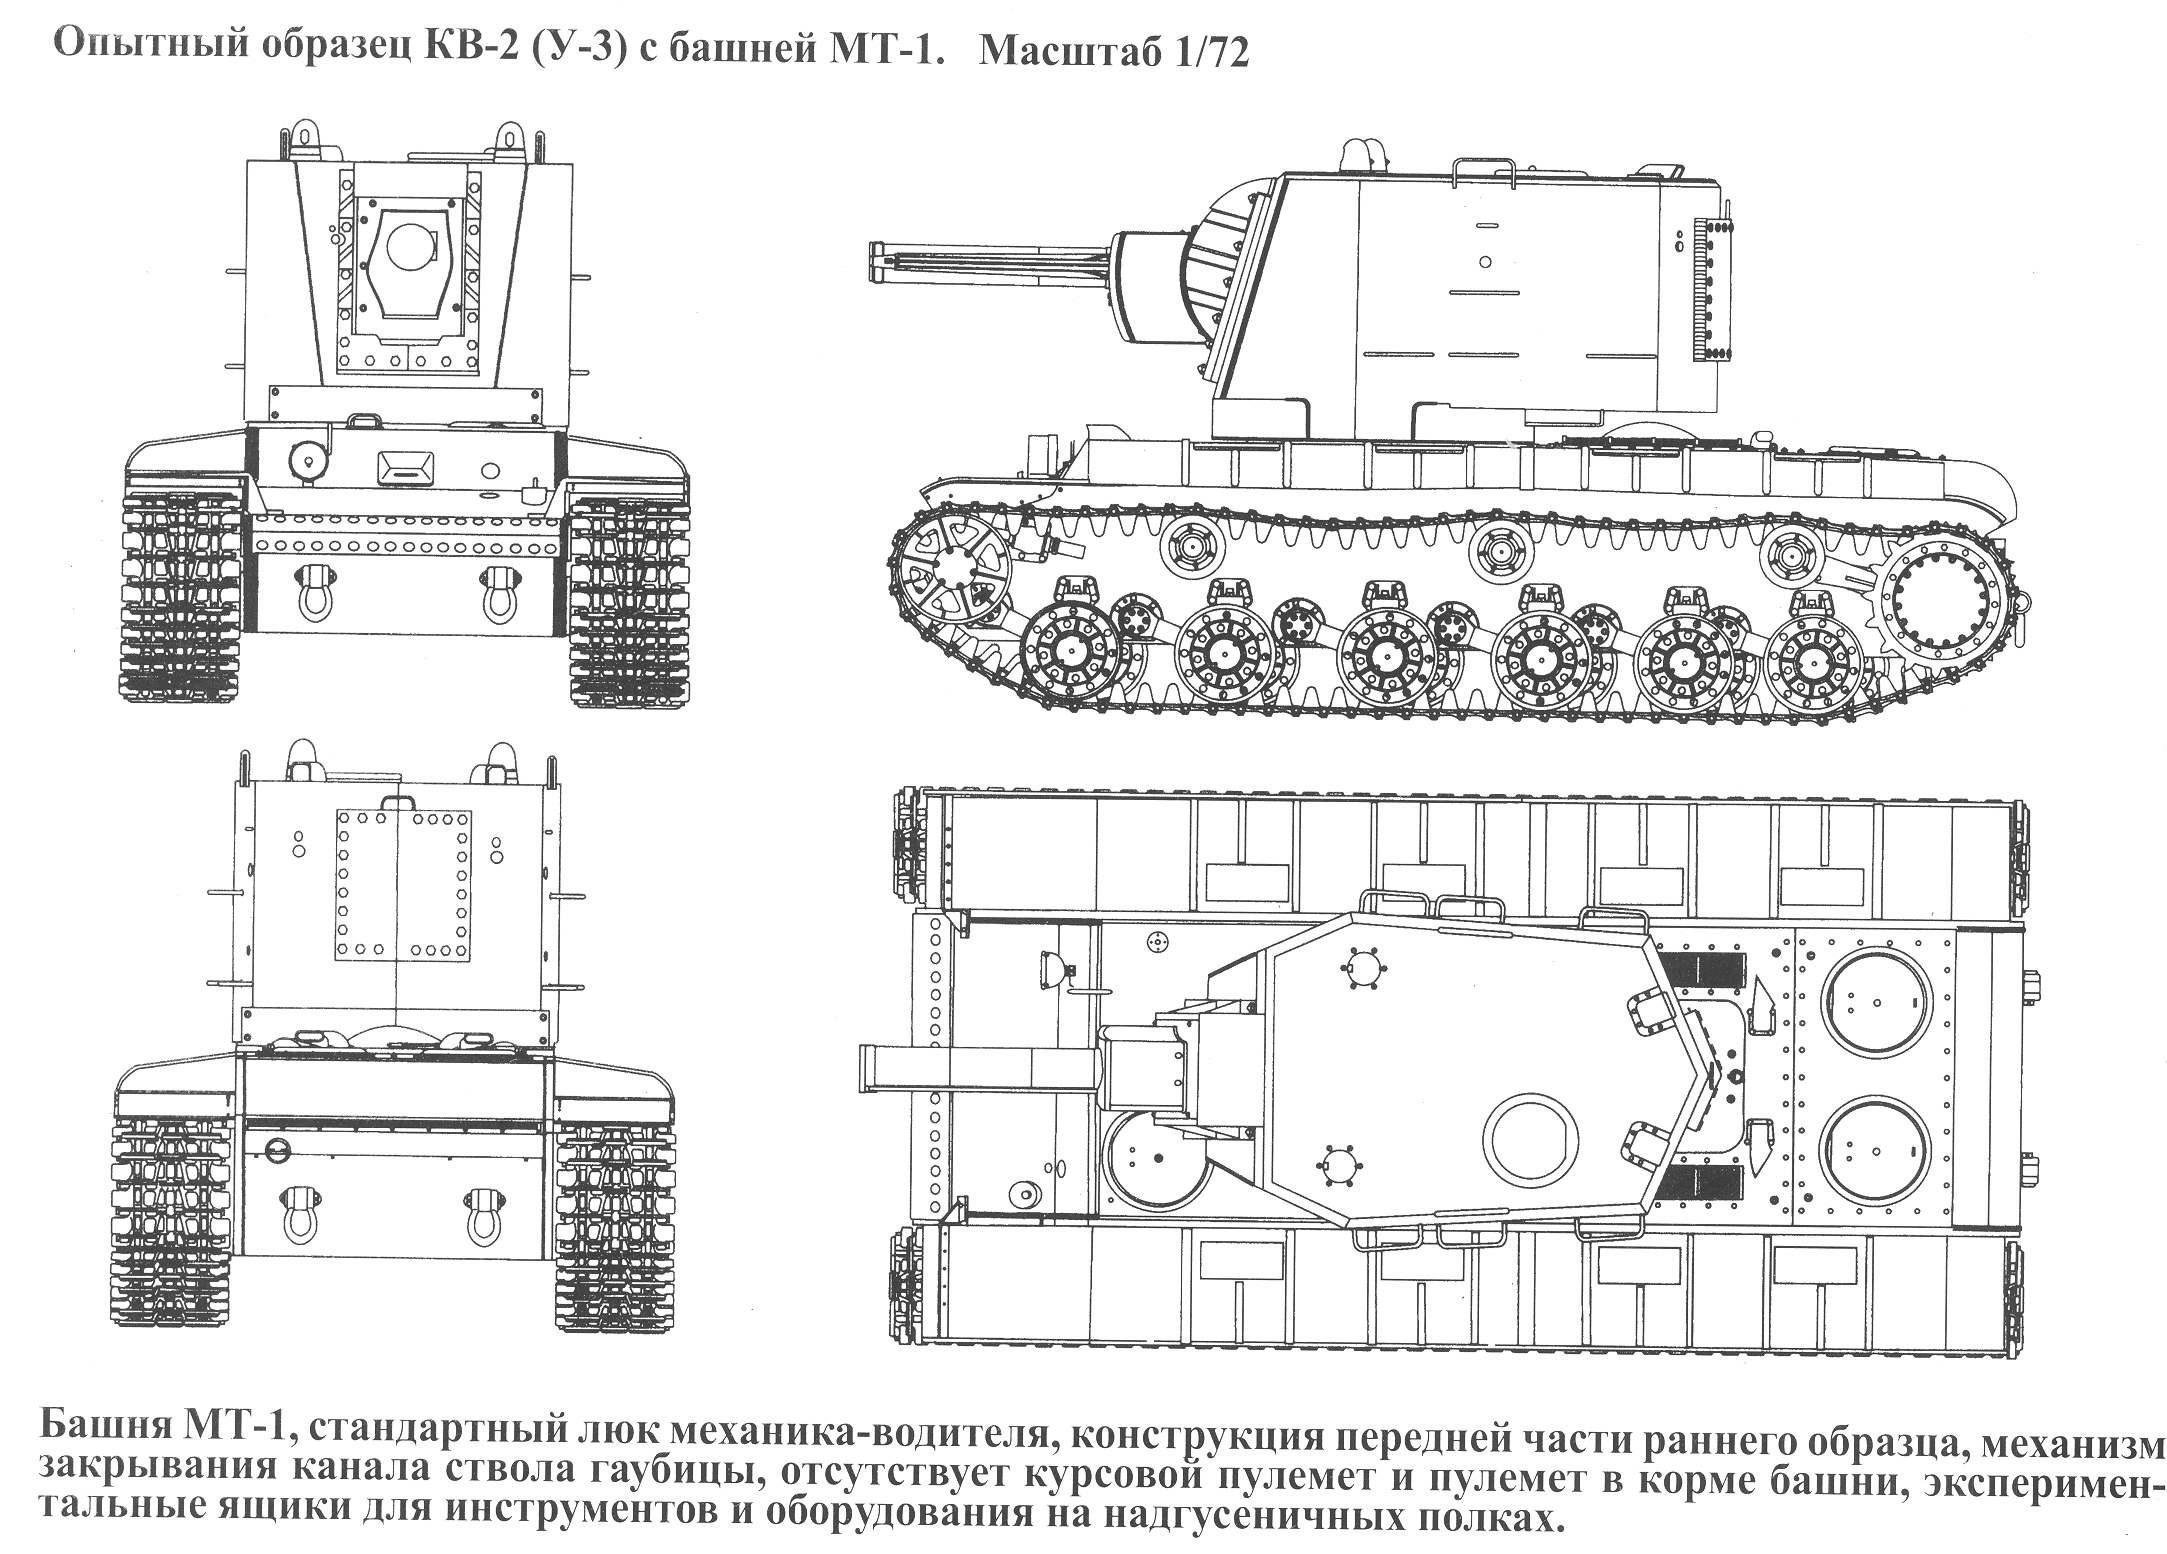 KV-2 Soviet heavy self propelled gun (1940)